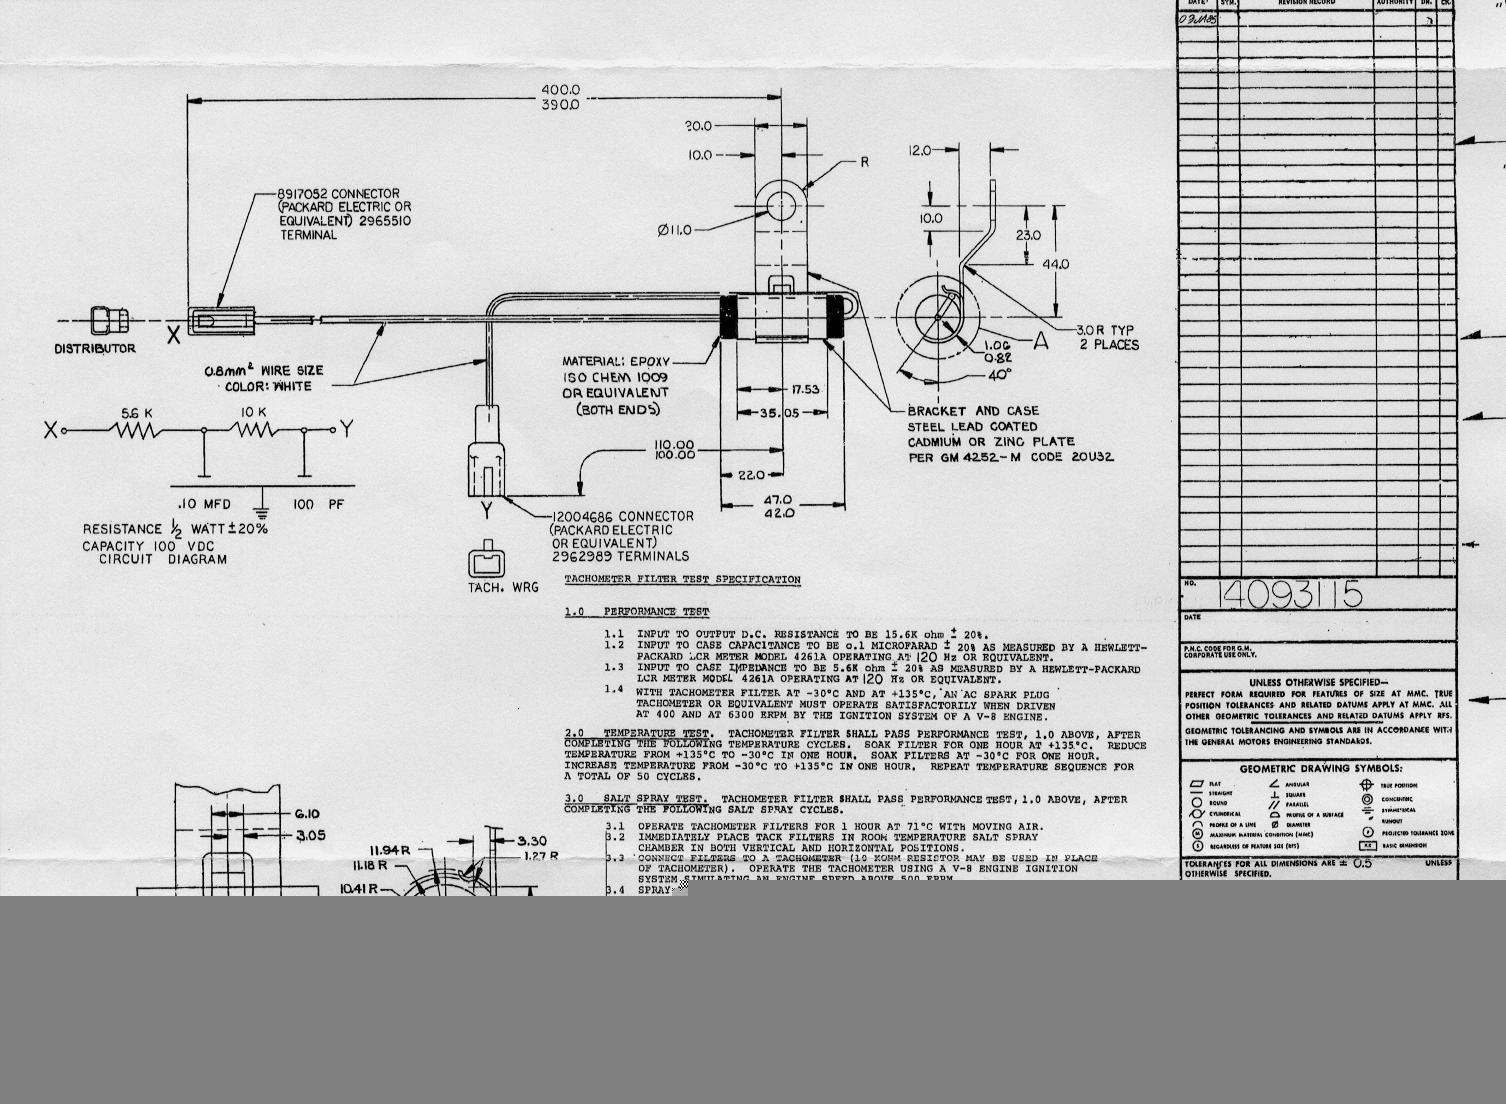 Corvette Tach Filter Schematic Engine Control Wiring Diagram 1990 Tech Corvetteforum Chevrolet Forum Discussion Rh Com Gm Hei